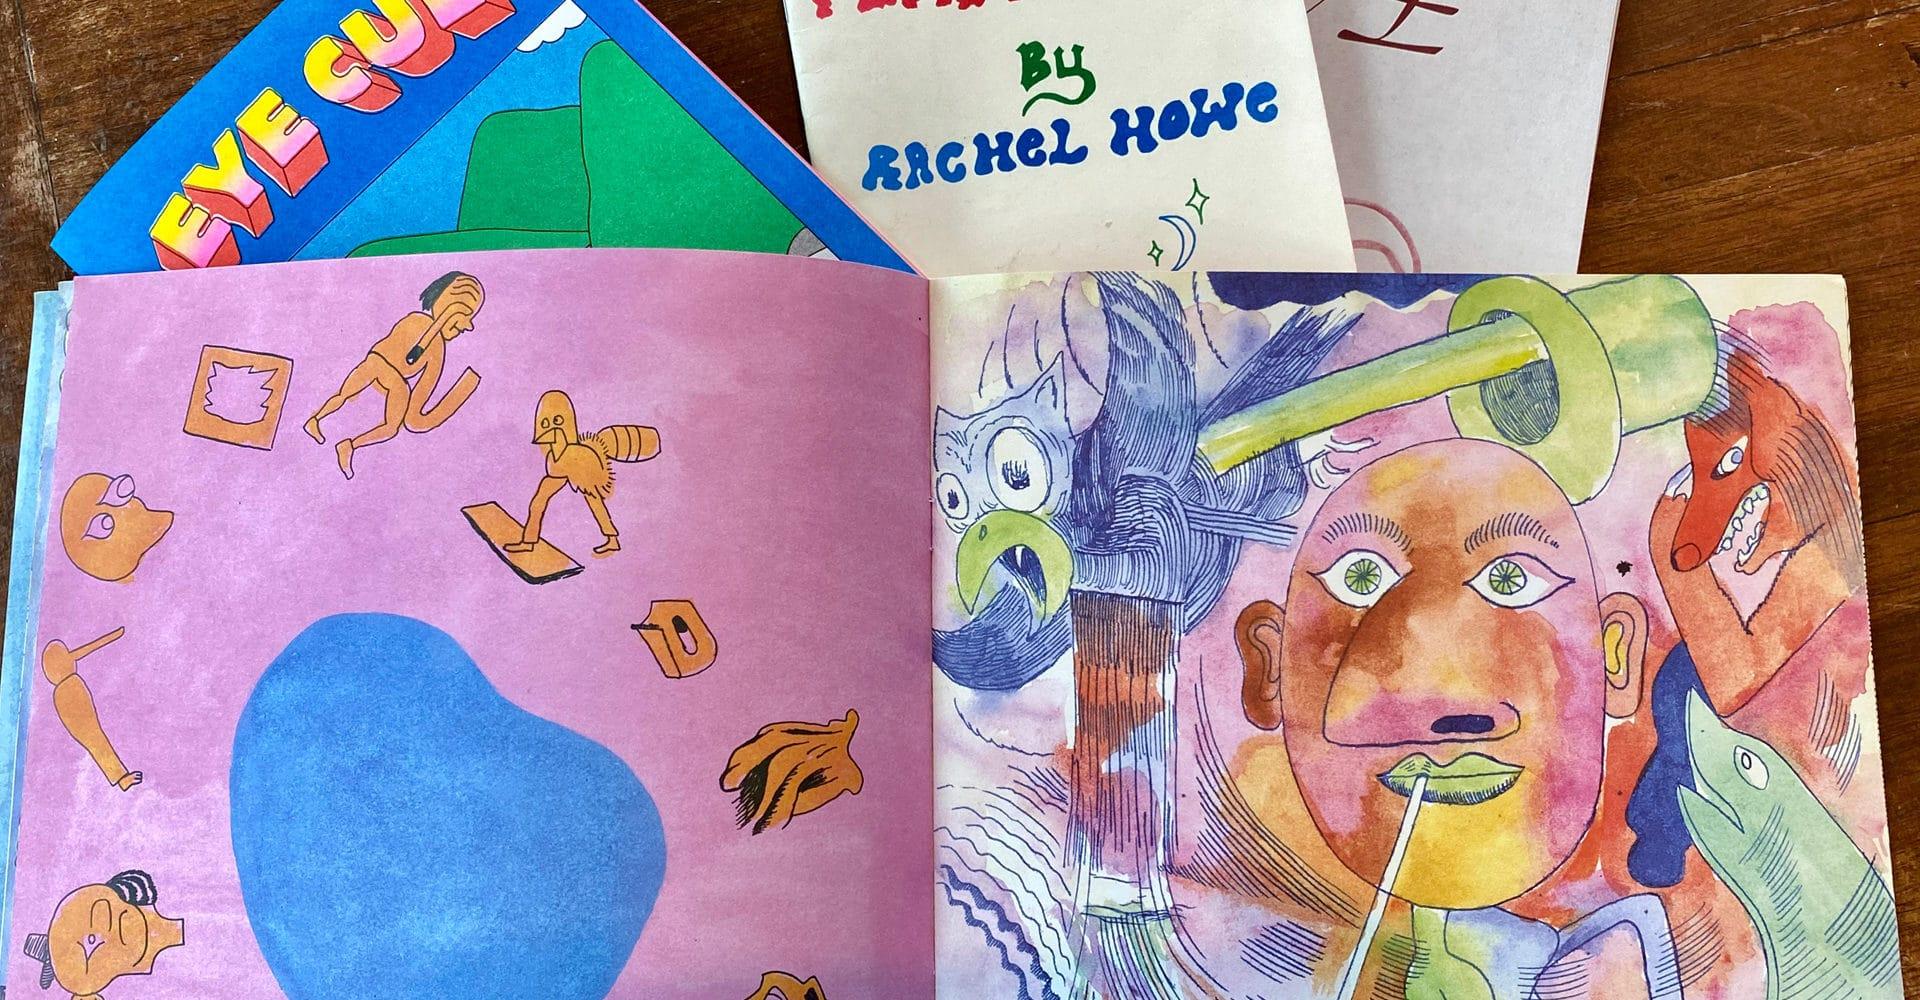 #ZINESonZOOM: In Partnership with Art Life Practice